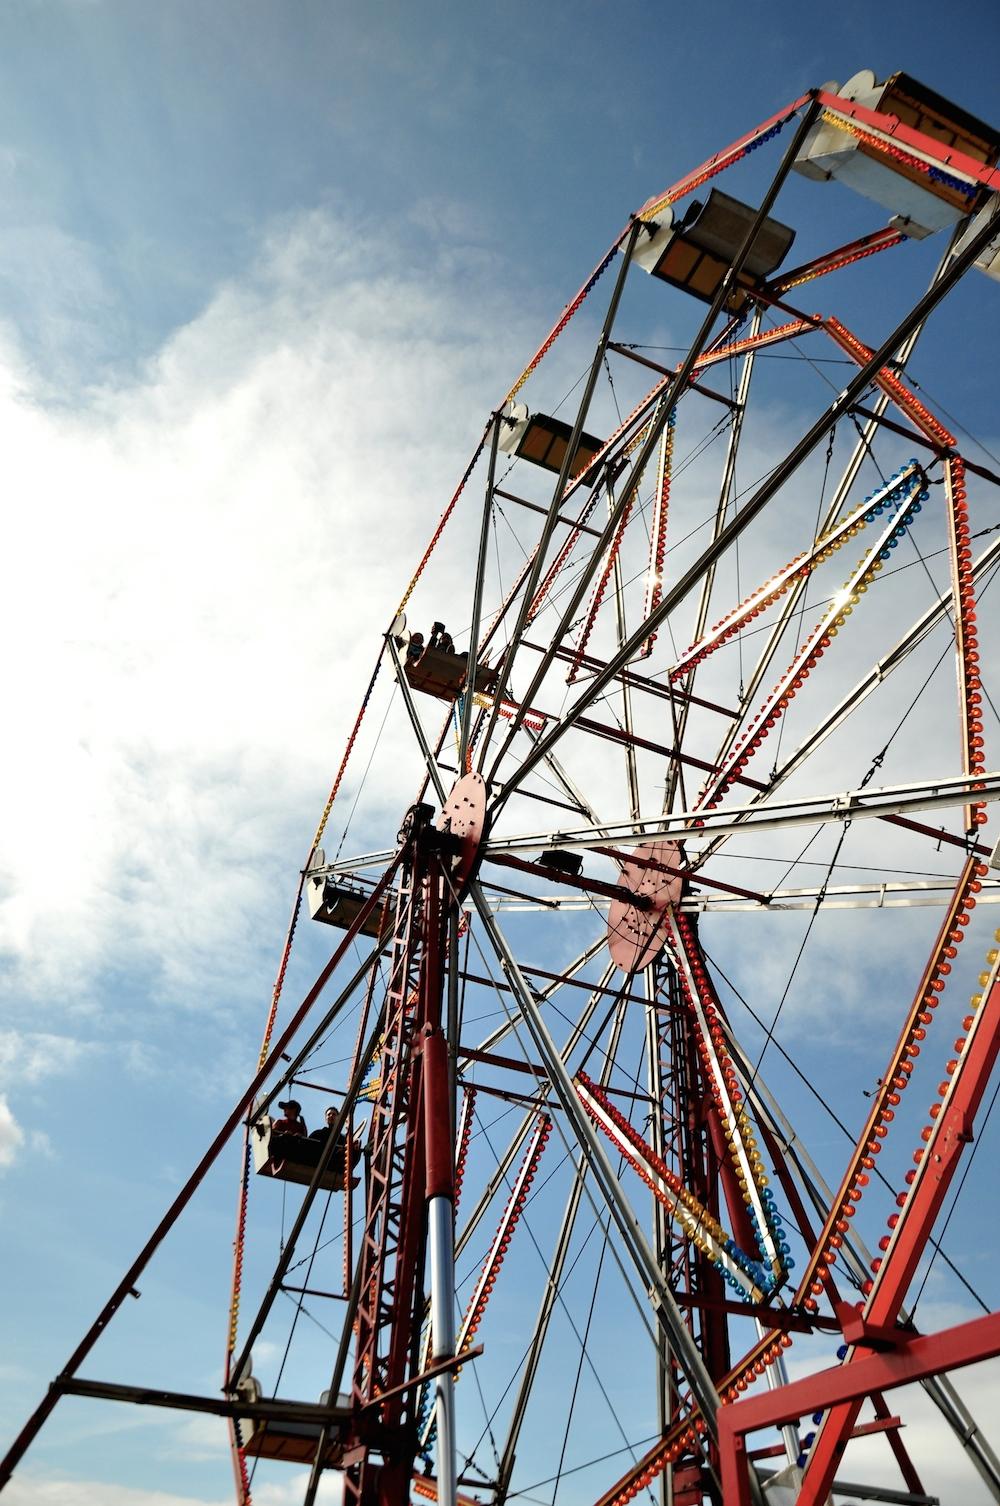 ferris_wheel_dismaland_banksy